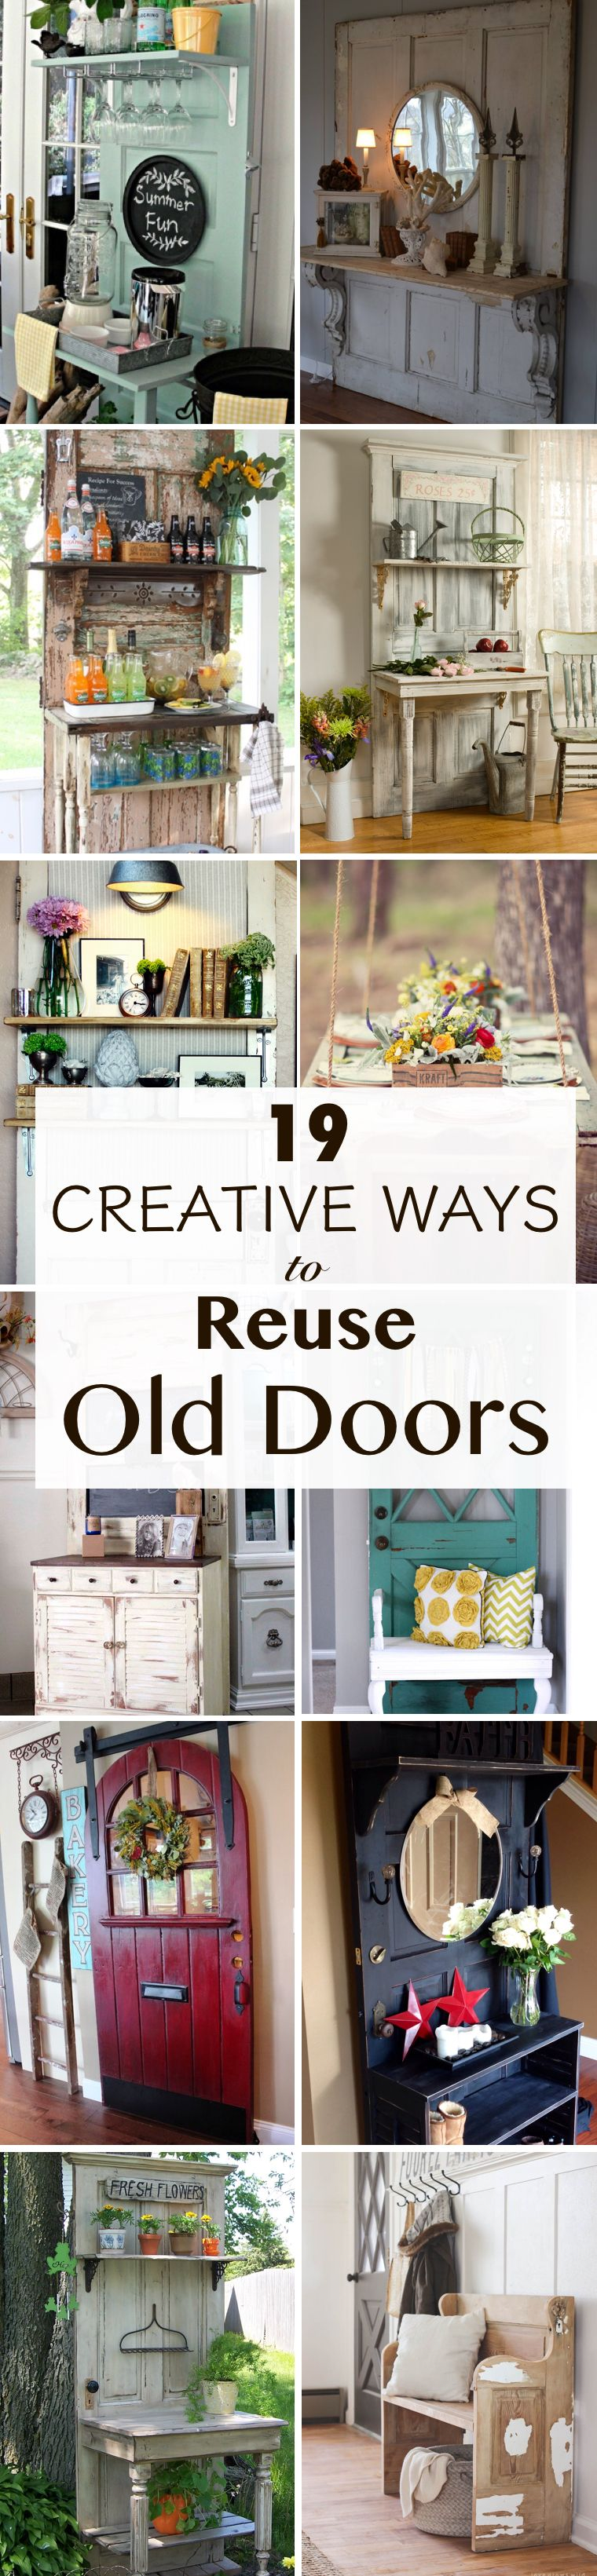 25 DIY Wonderful Ideas for Reusing Old